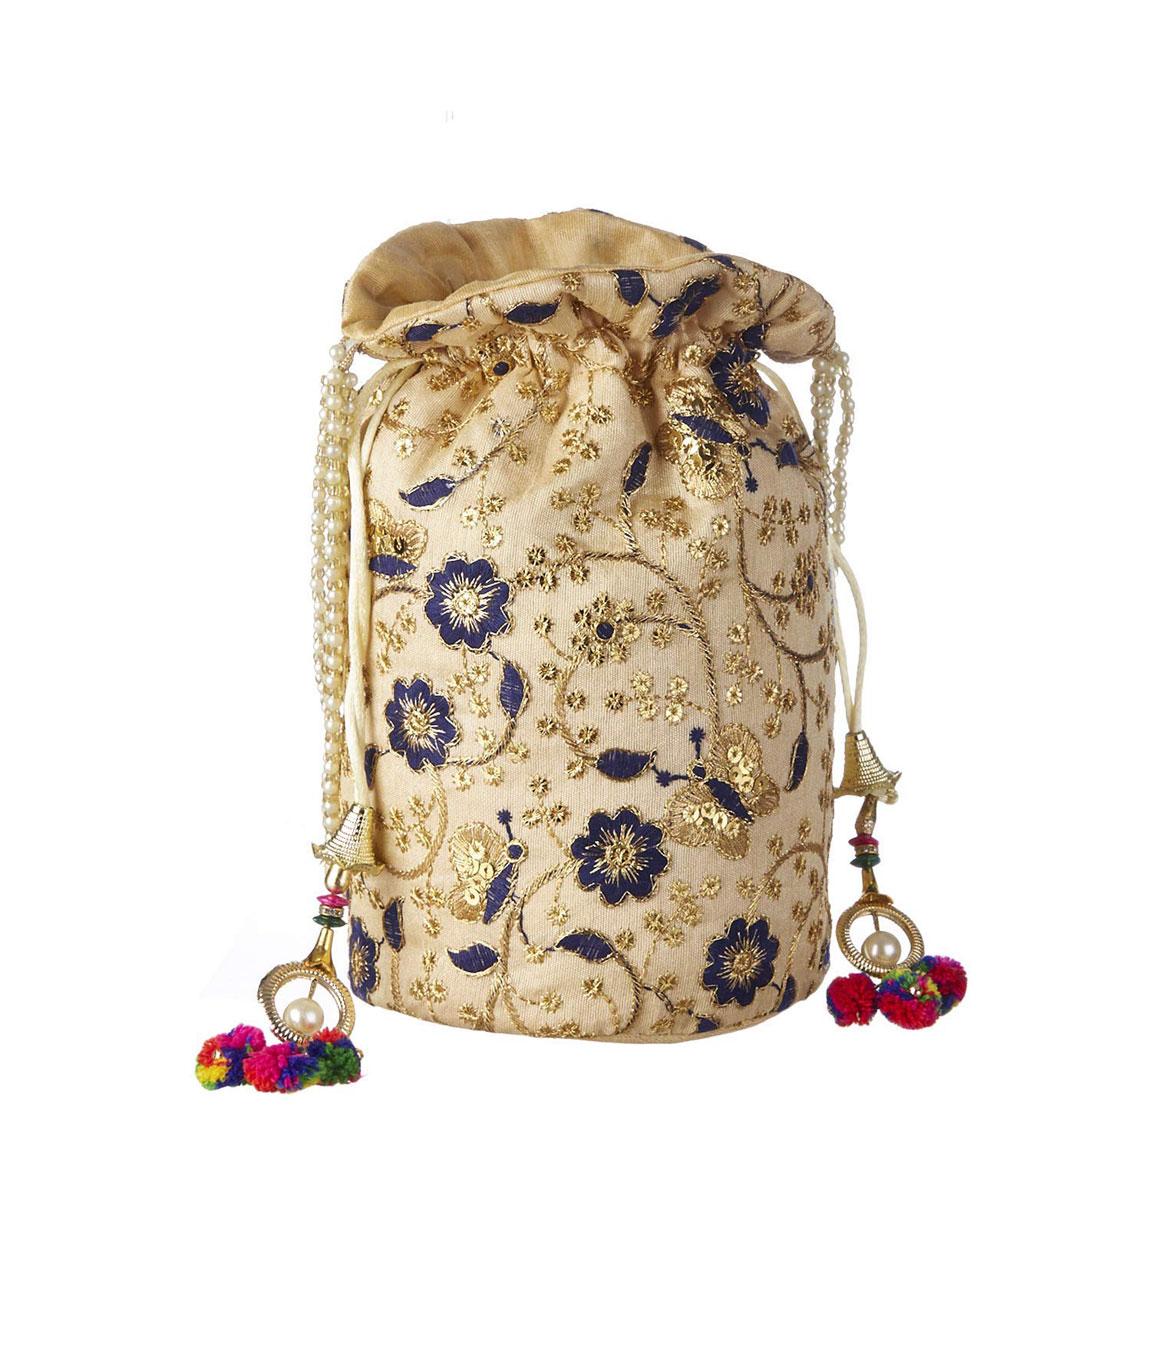 DN Enterprises Rajasthani Embrodired Royal Designer Potli Bag